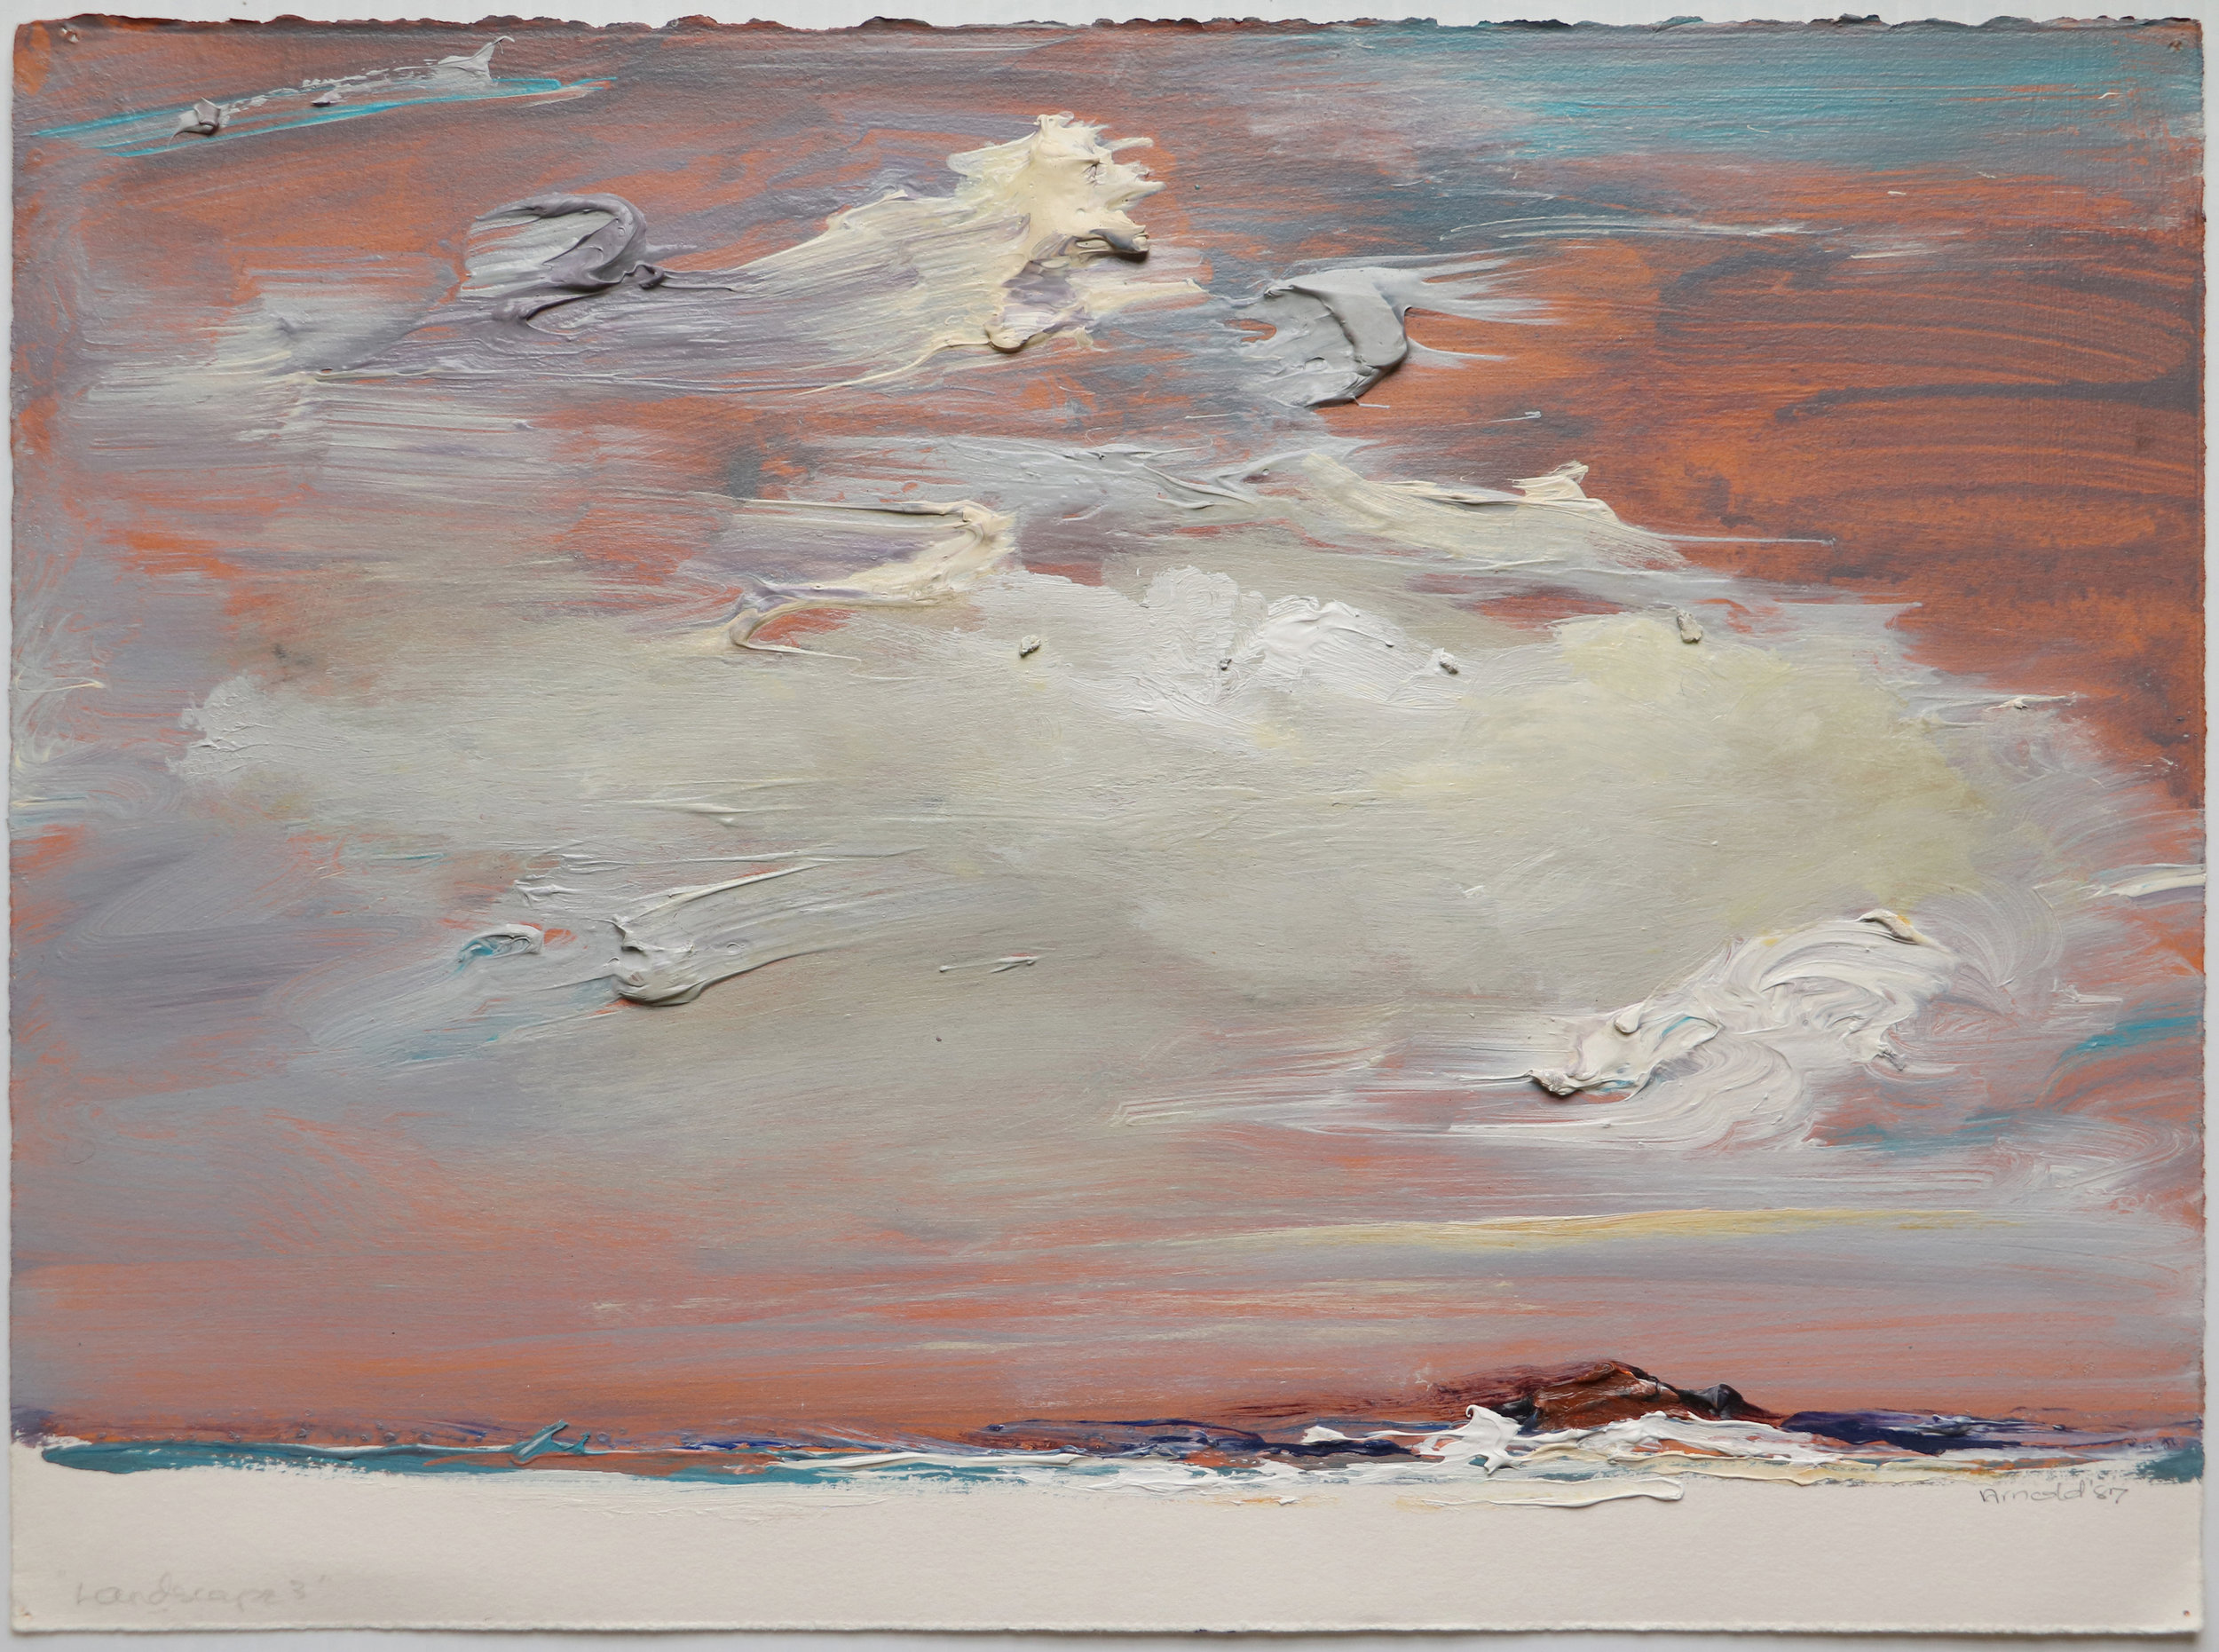 Doffie Arnold, Landscape #3, from the Crane Beach series. Pastel on paper, 1987.